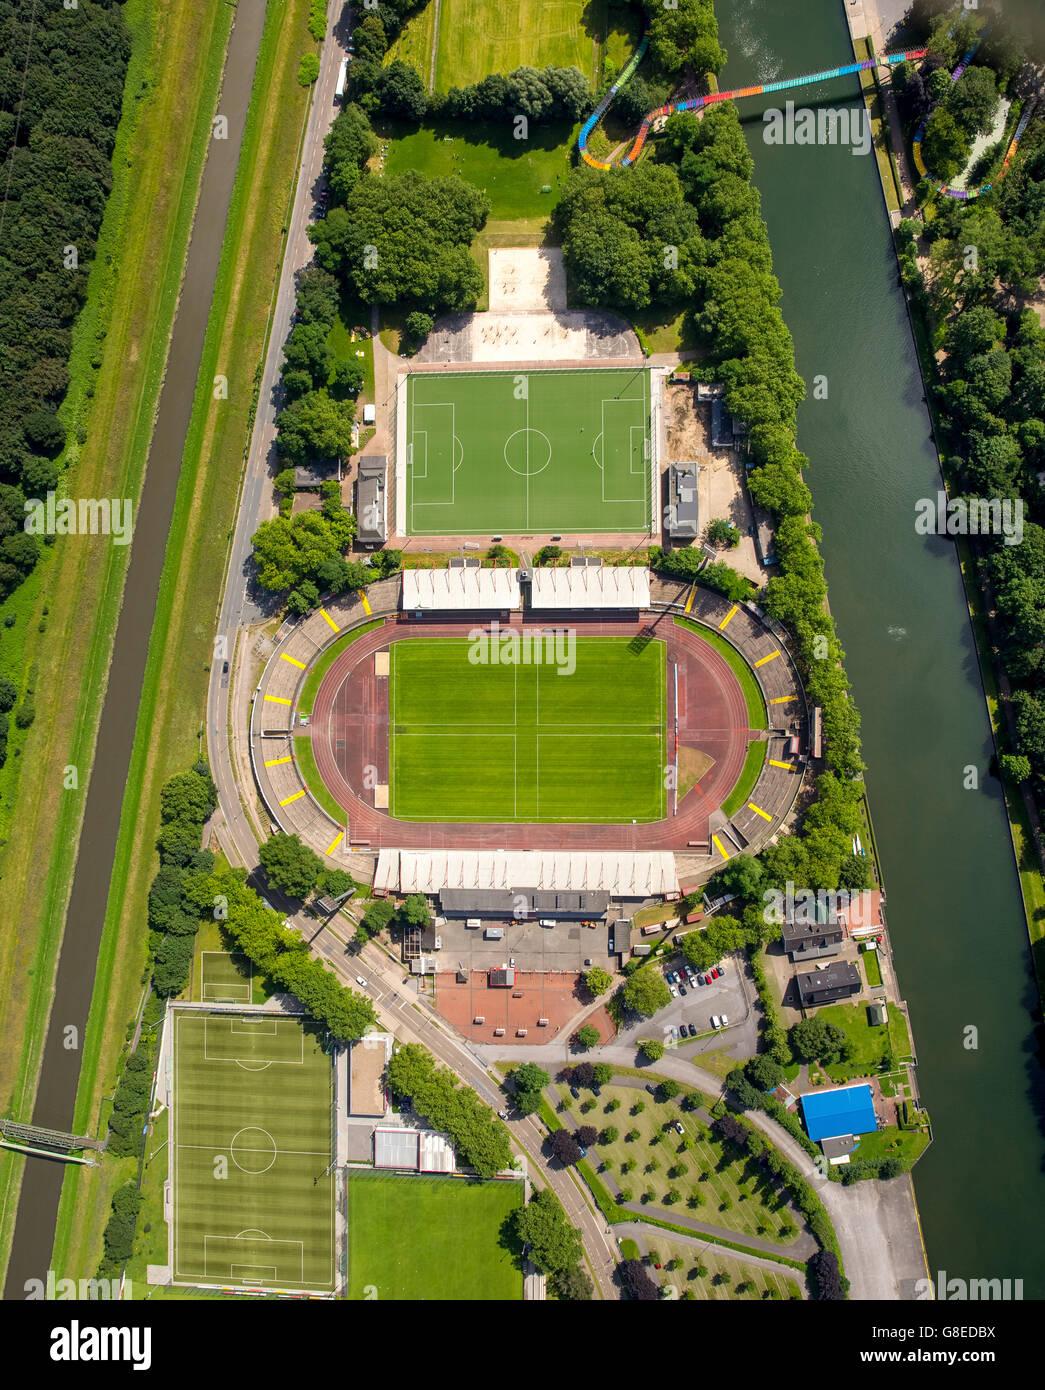 Aerial view, Stadion Niederrhein, SC Rot-Weiß Oberhausen e.V., TC Sterkrade 1869 e.V., Emscher Rhine-Herne - Stock Image